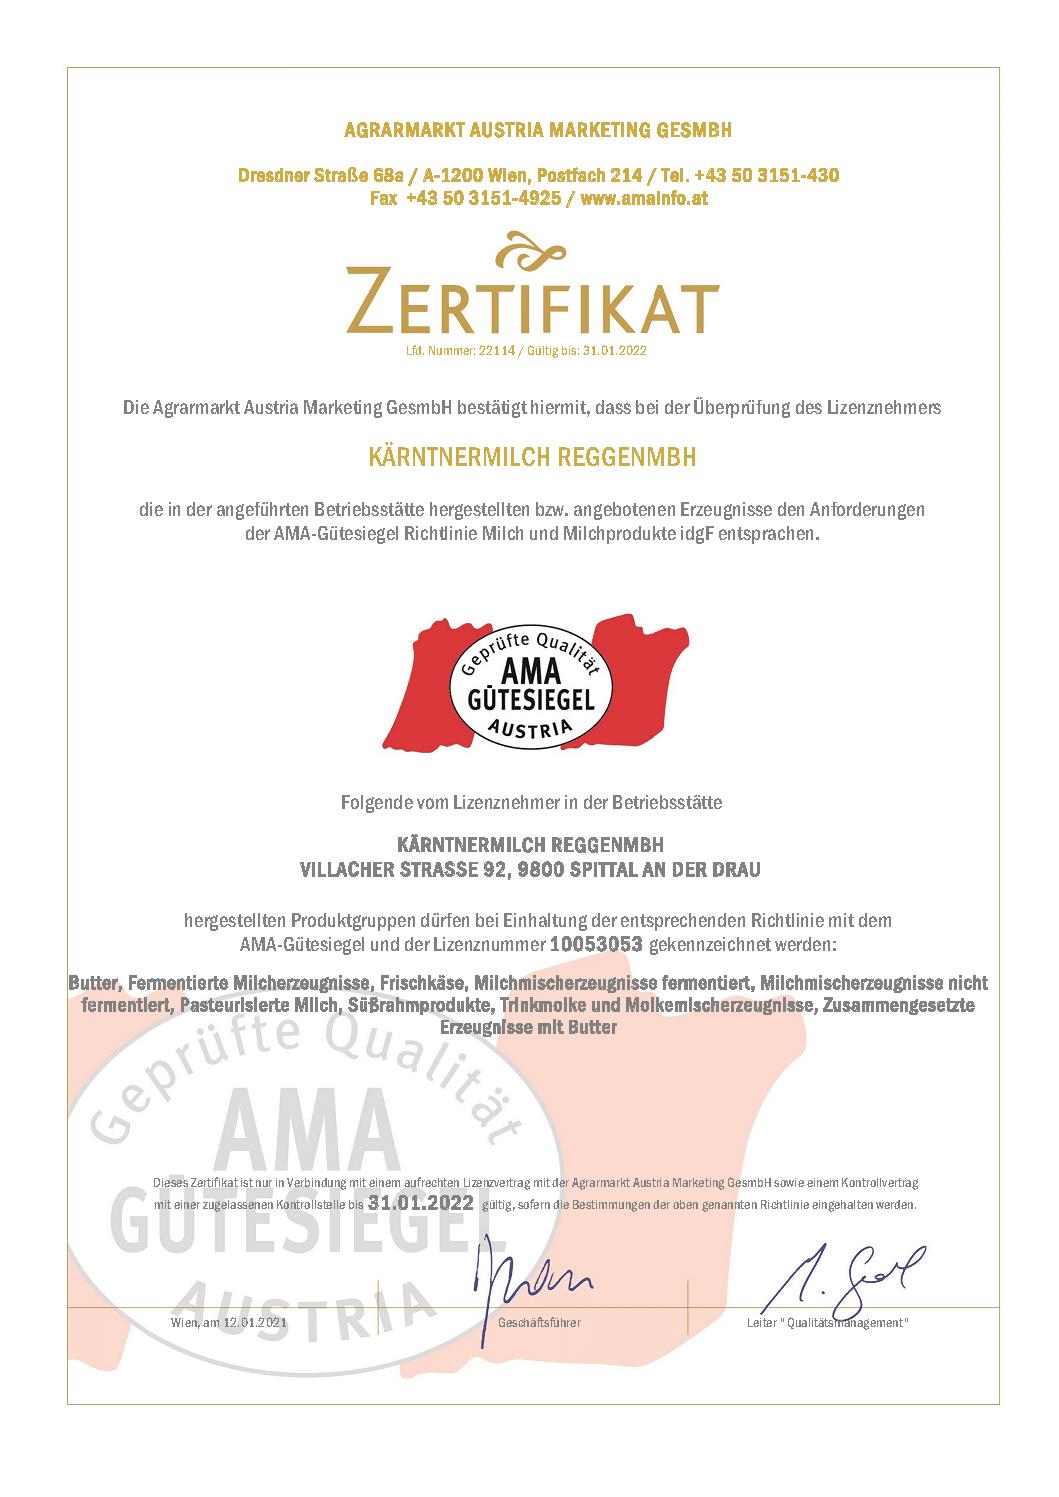 ama-alpenregion-kaerntnermilch-reggengmbh-zertifikat-2